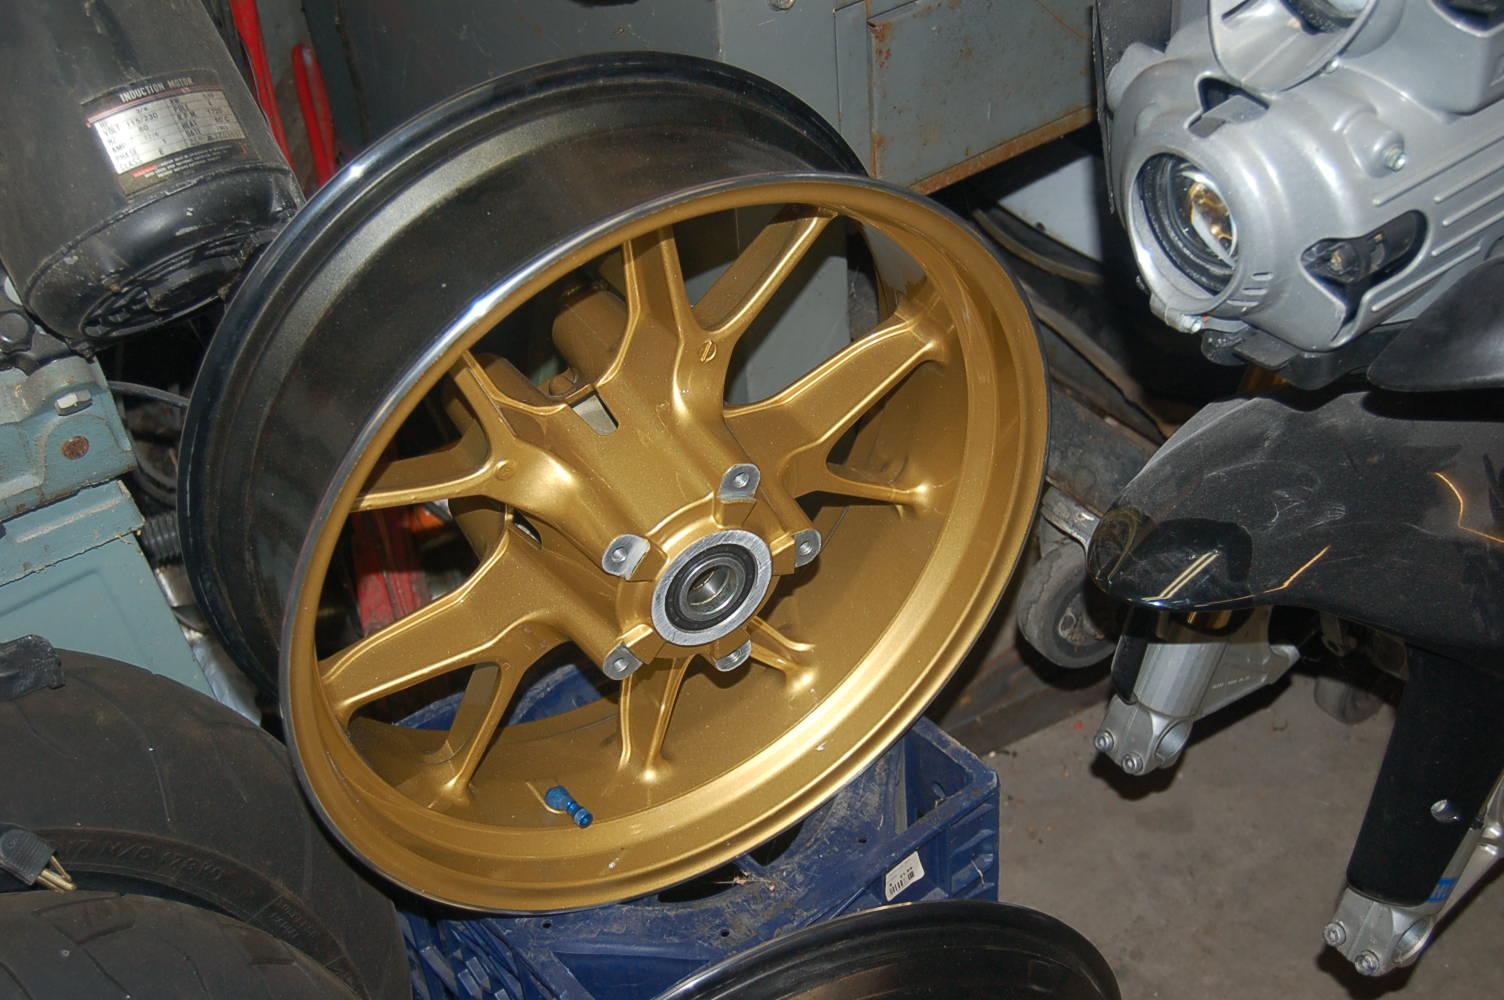 749R powdercoating wheels gold - Ducati.ms - The Ultimate ...